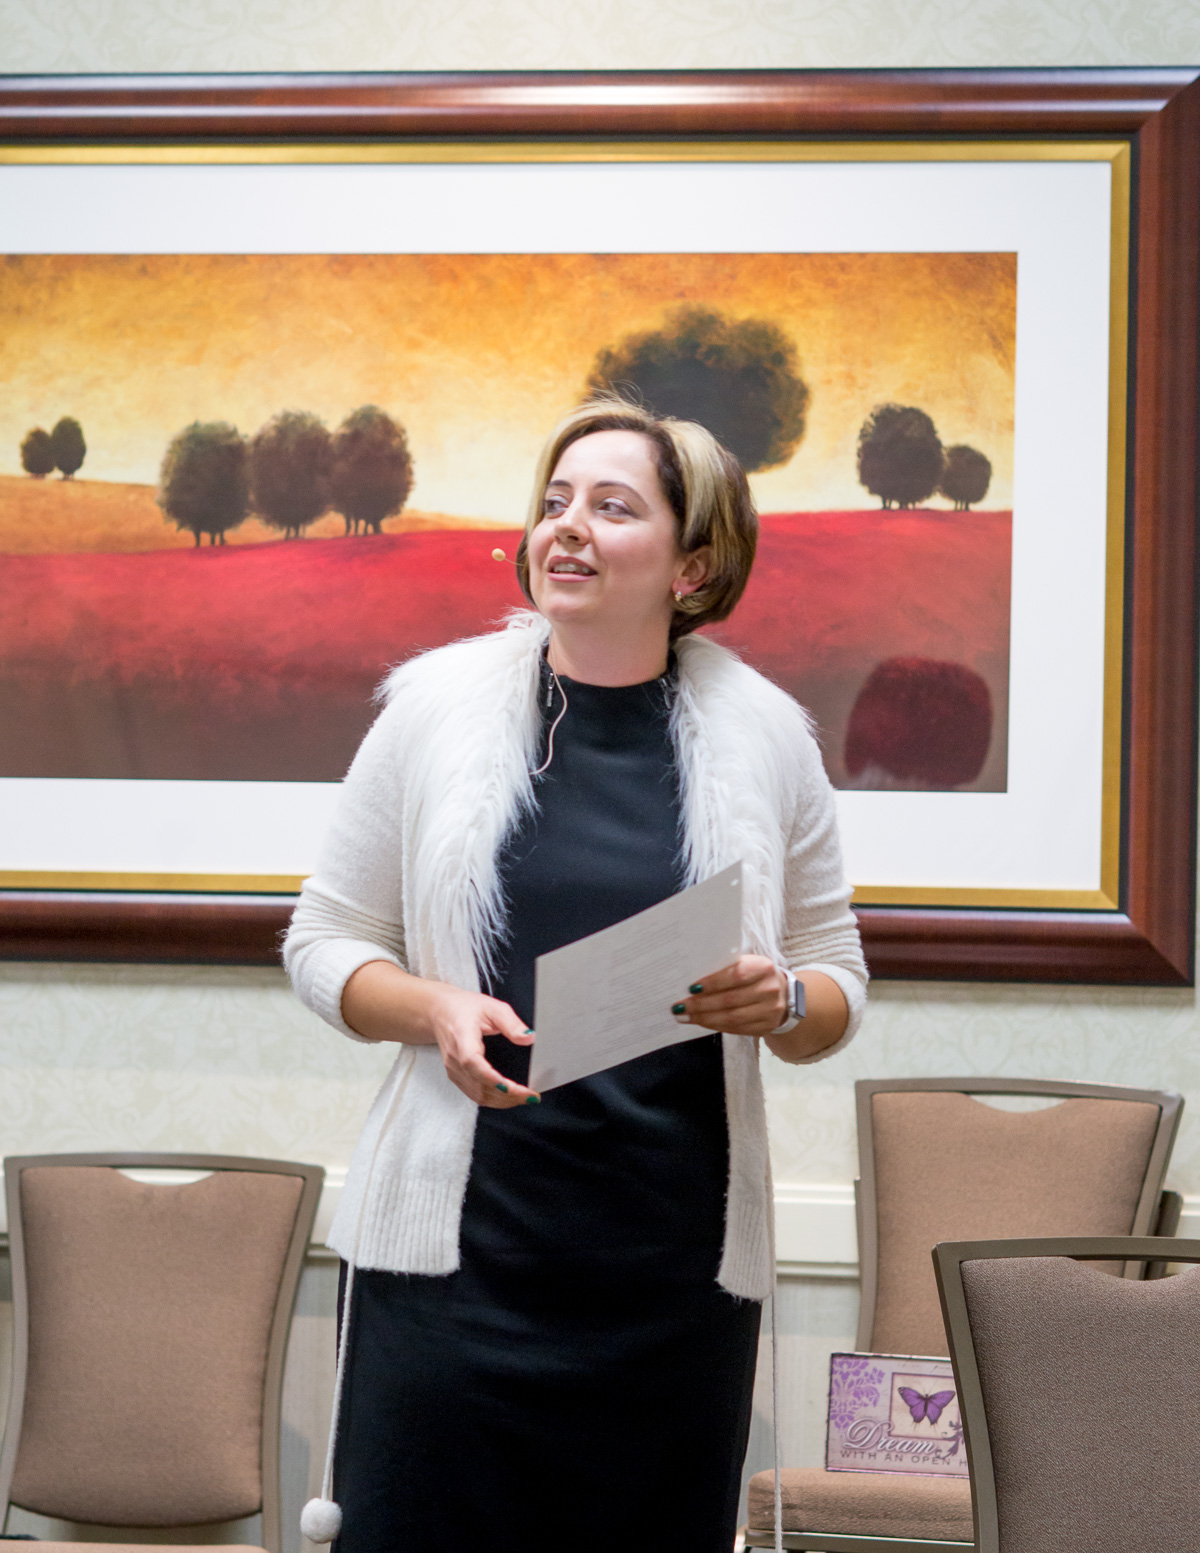 Zhanna Shpits, founder of the Hummingbird Academy